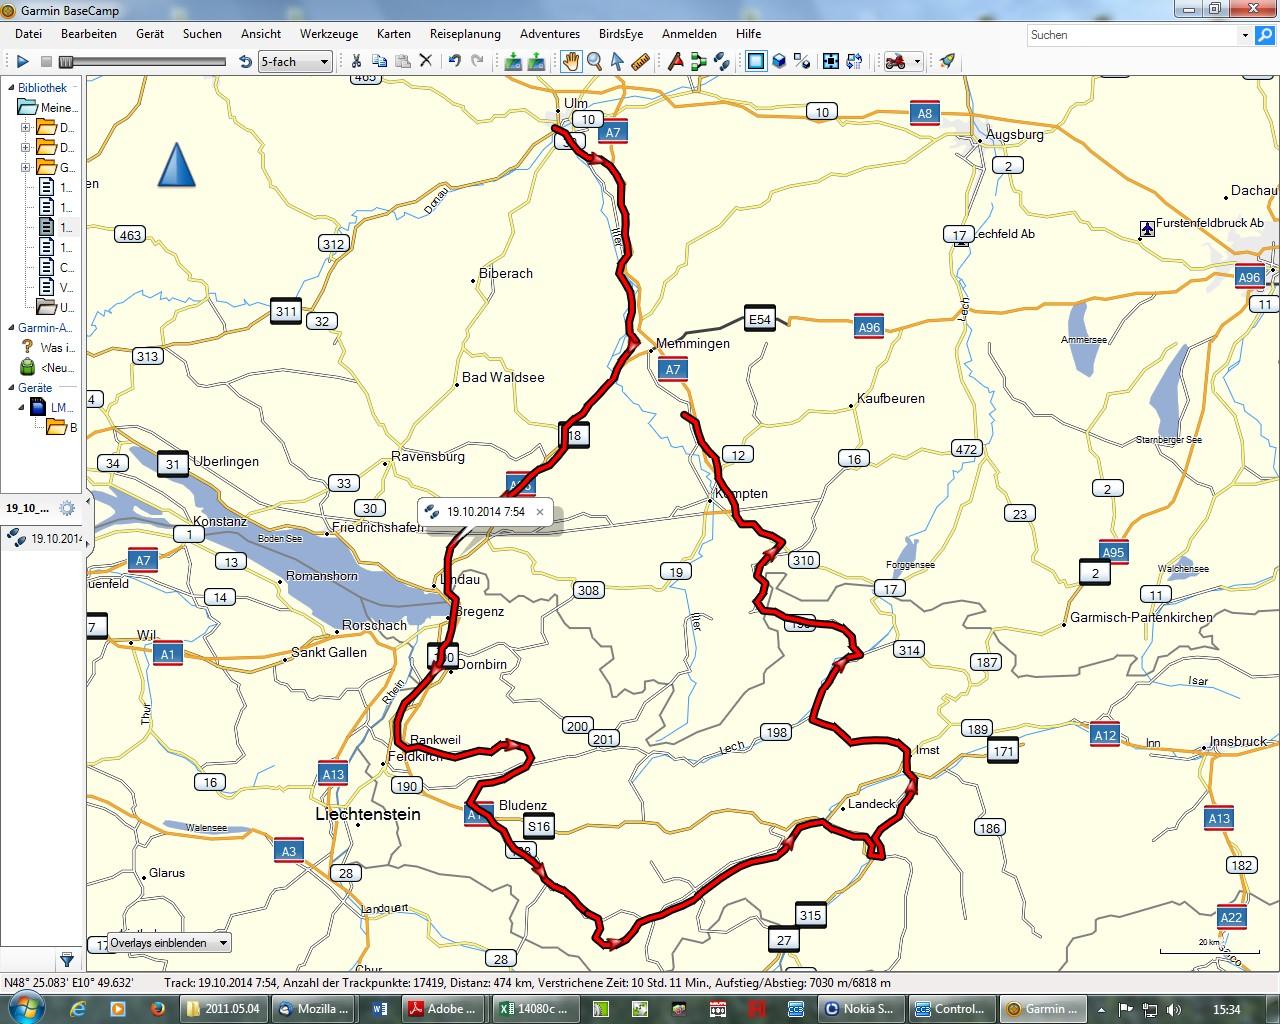 tour-2014-10-19-karte.jpg